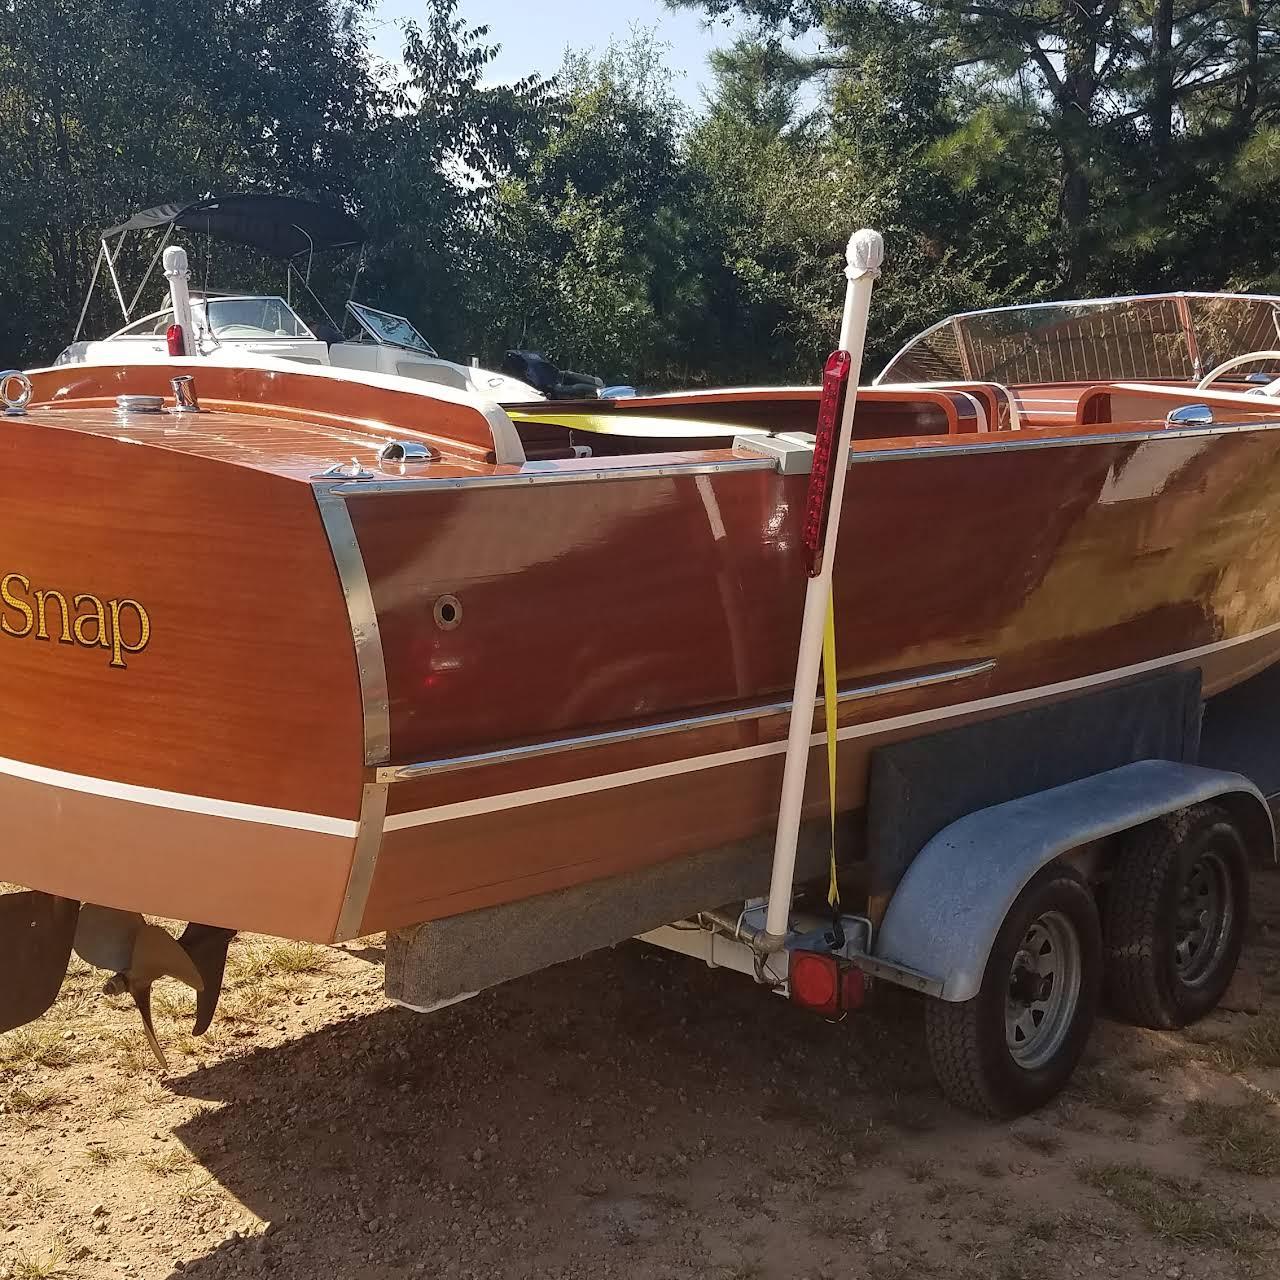 Matthew's marine service's - Boat and personal watercraft